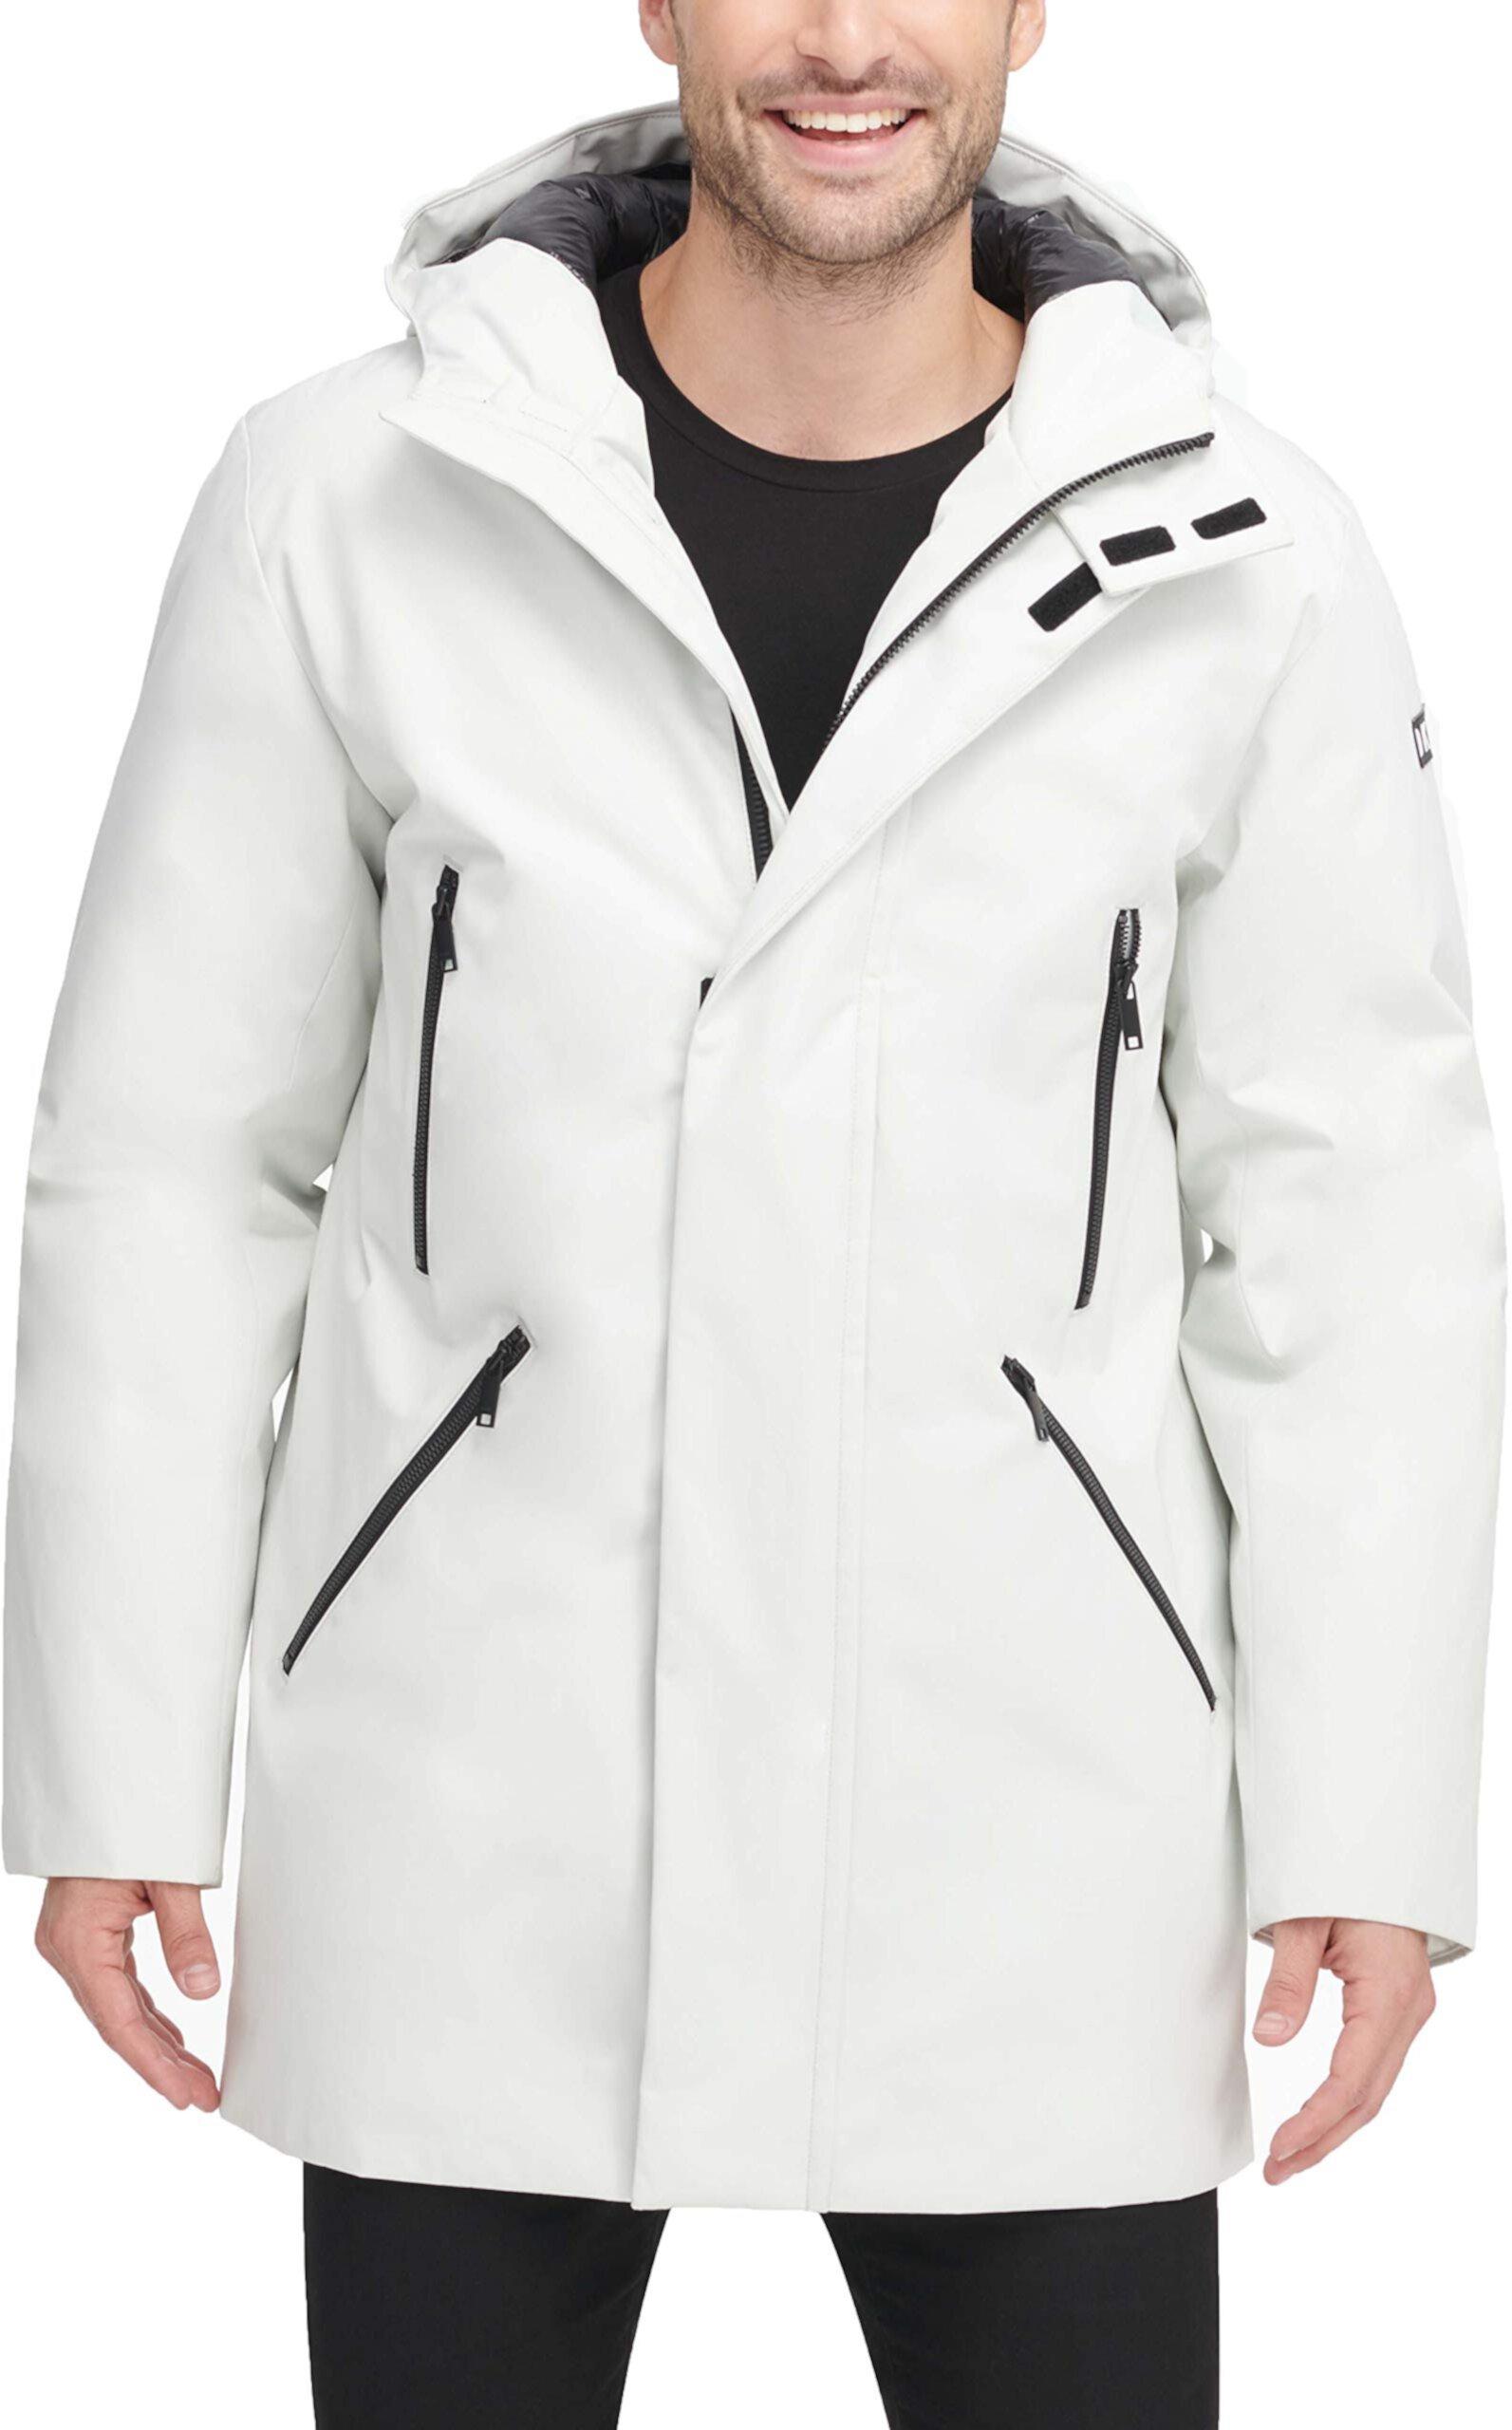 Водонепроницаемая куртка-парка с капюшоном и логотипом DKNY